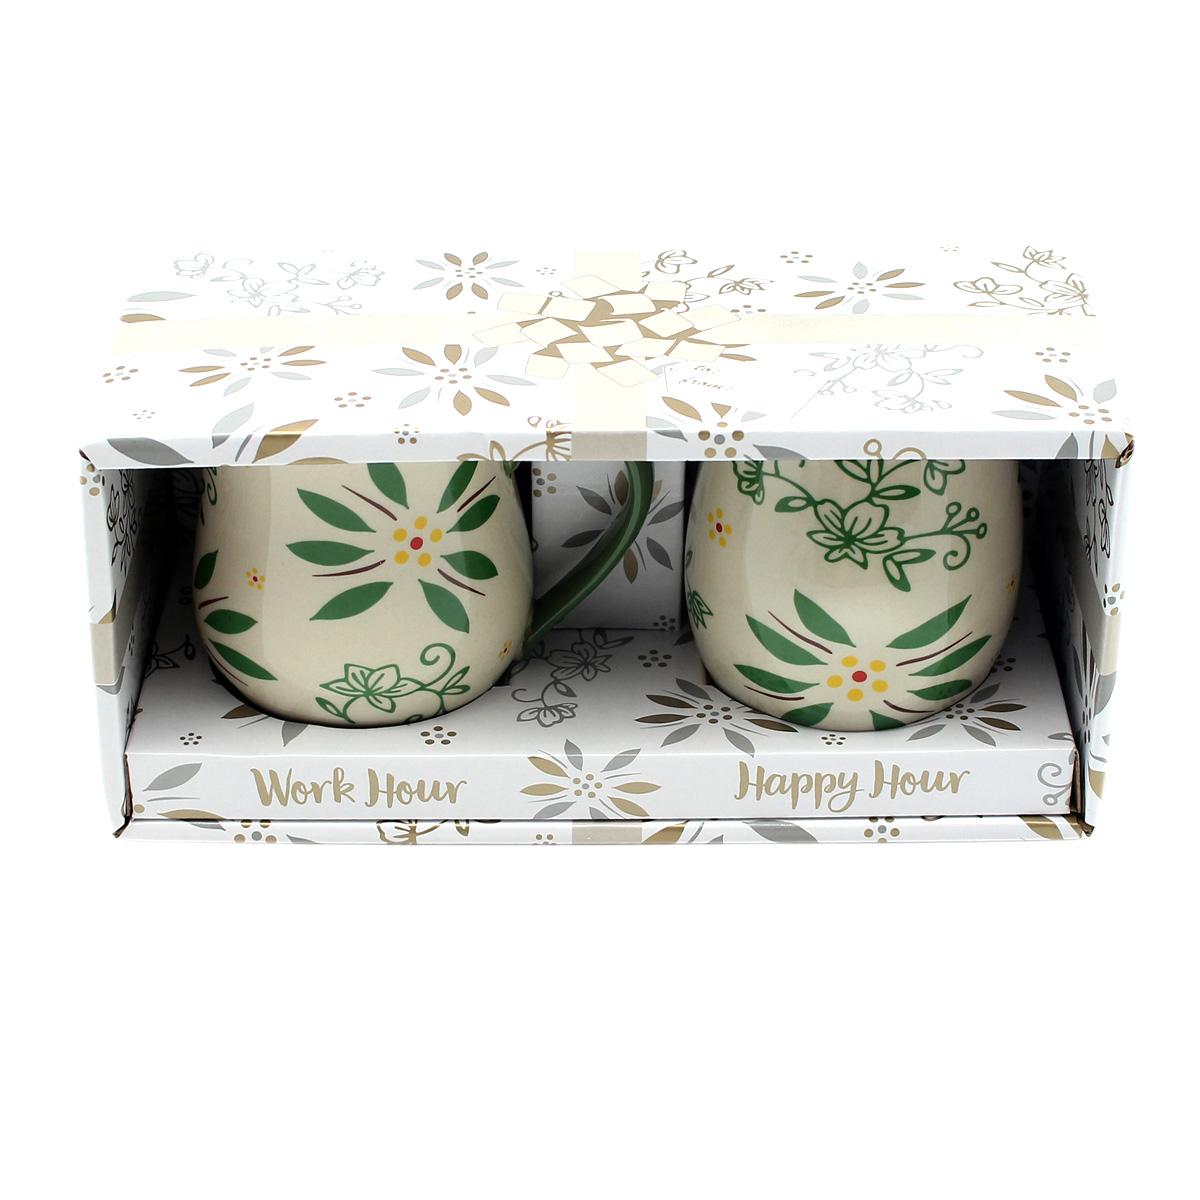 temp-tations® Day and Night Mug Gift Set – 2 Piece – Green